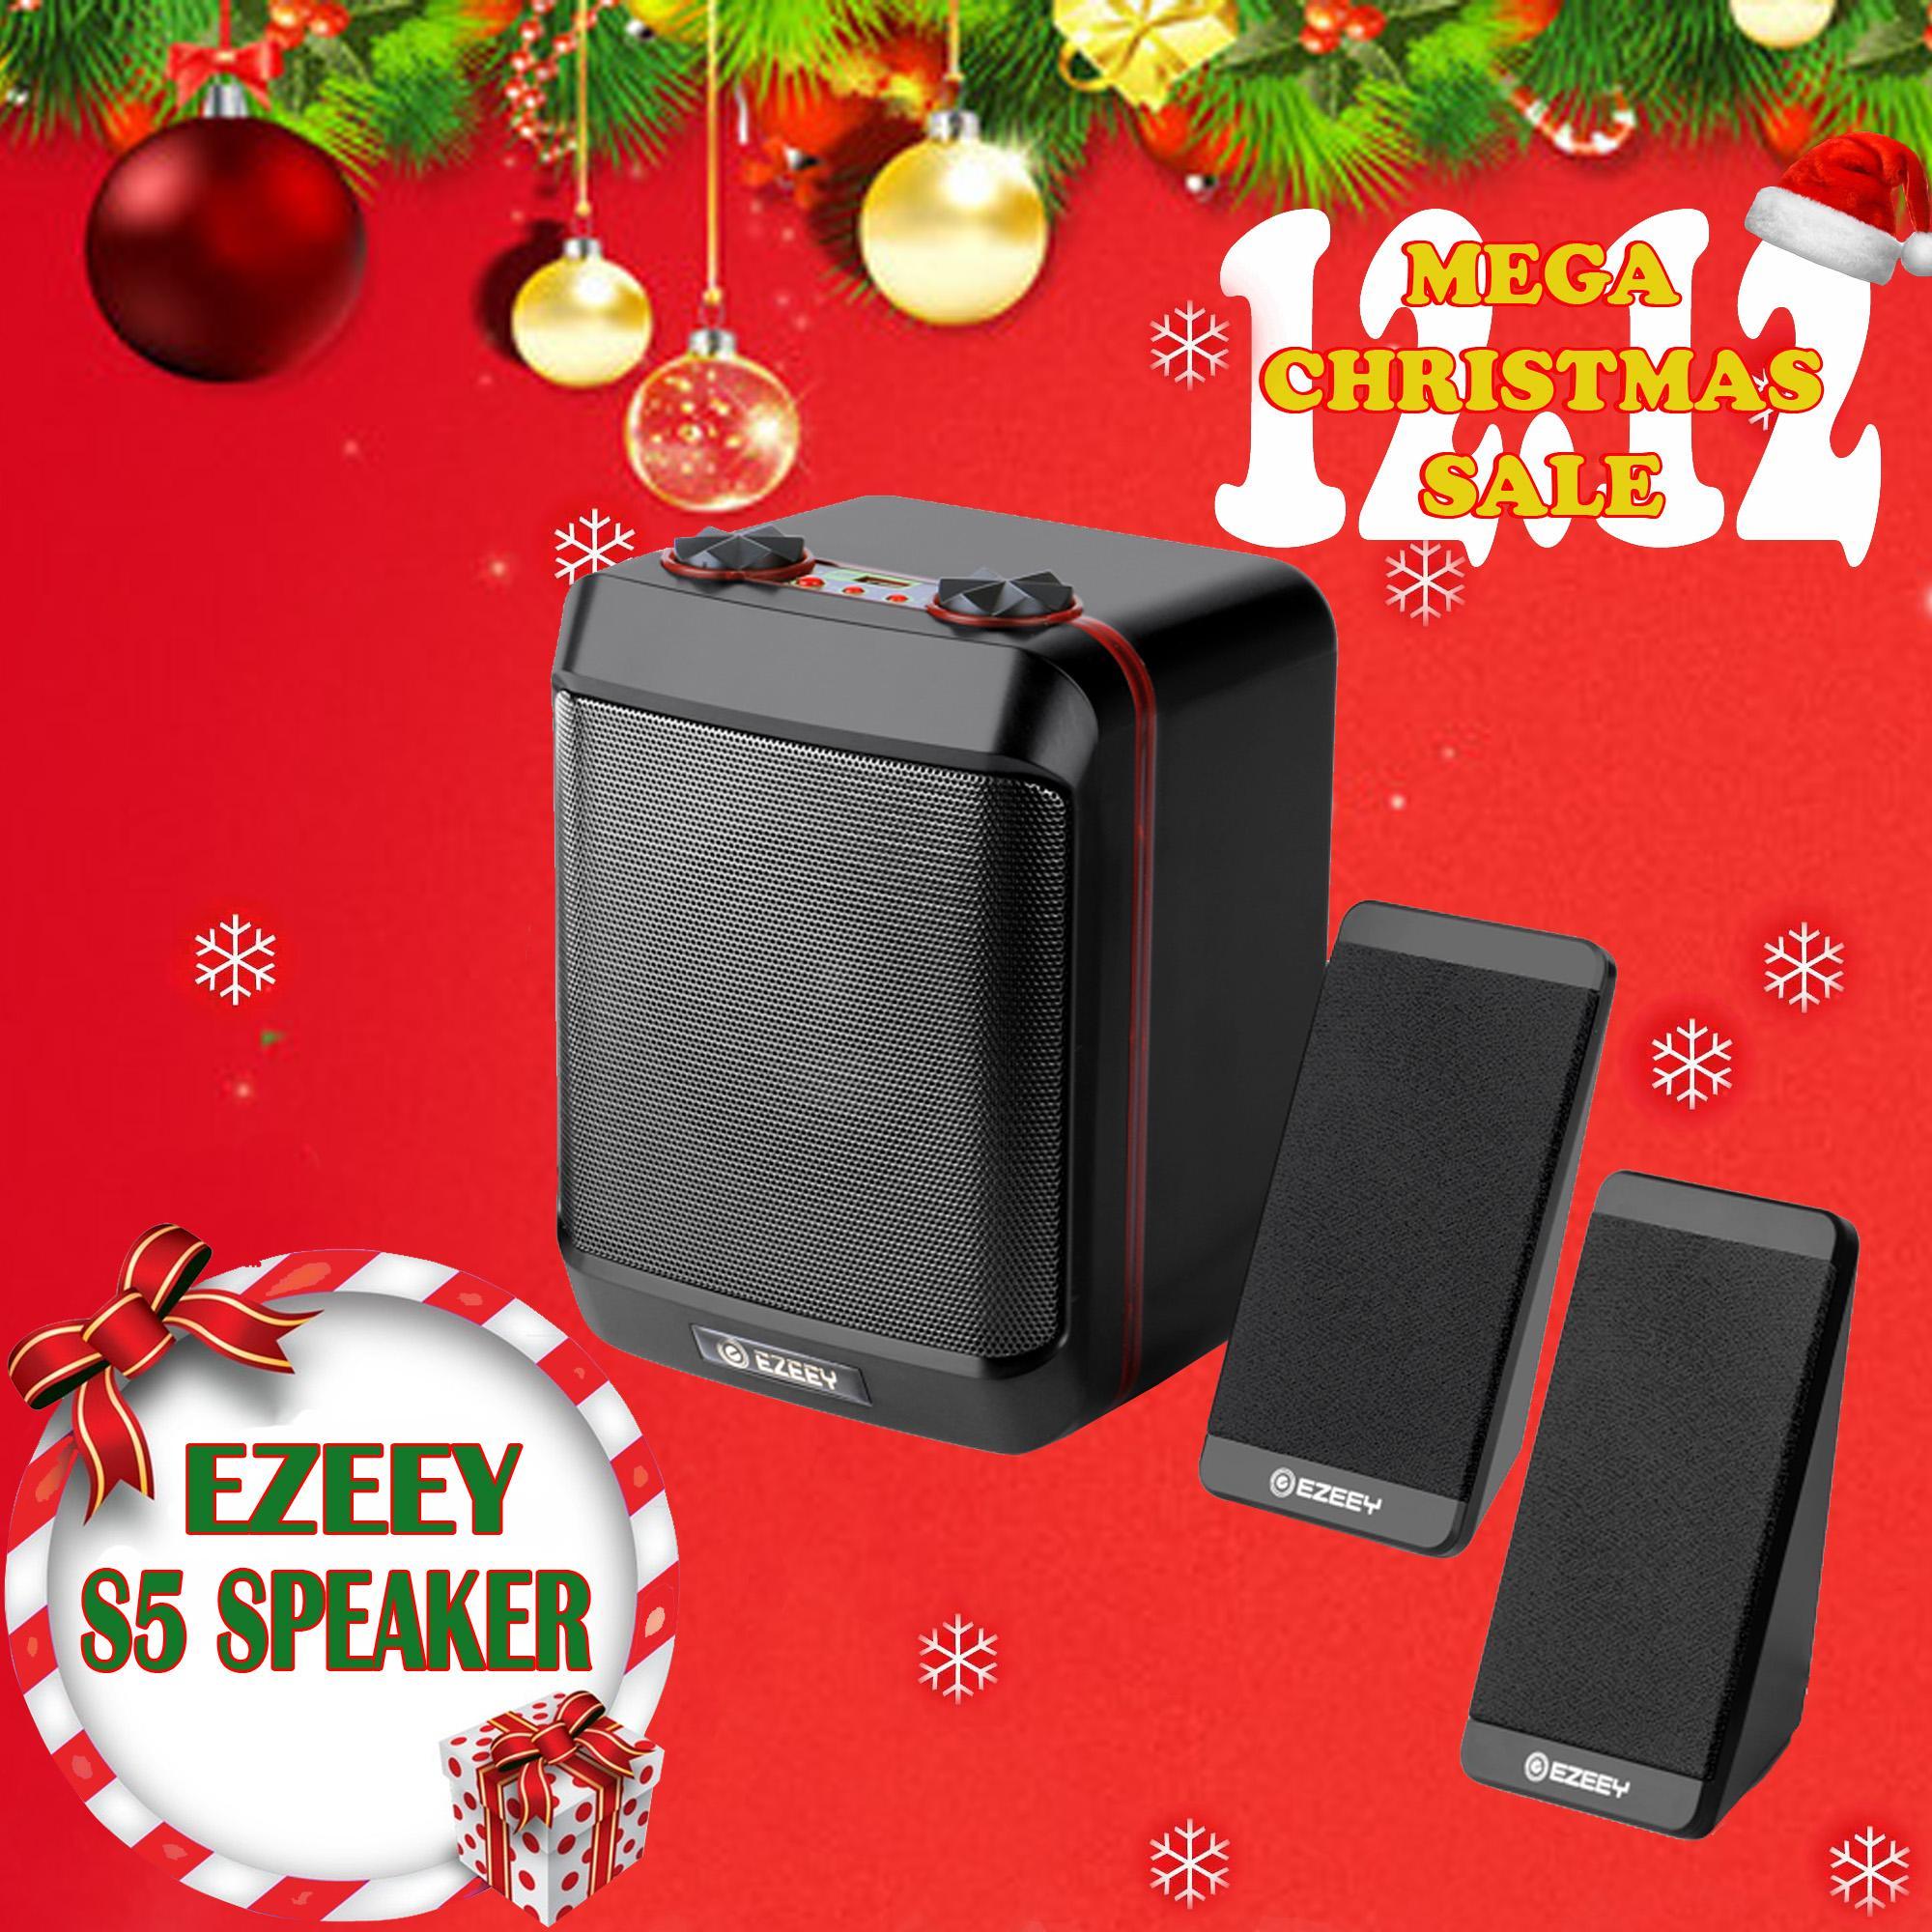 EZEEY S5-MAX - USB 3 5mm 2 1 Heavy Bass Speaker for Desktop Laptop Notebook  Tablet FM Radio SmartPhones PC